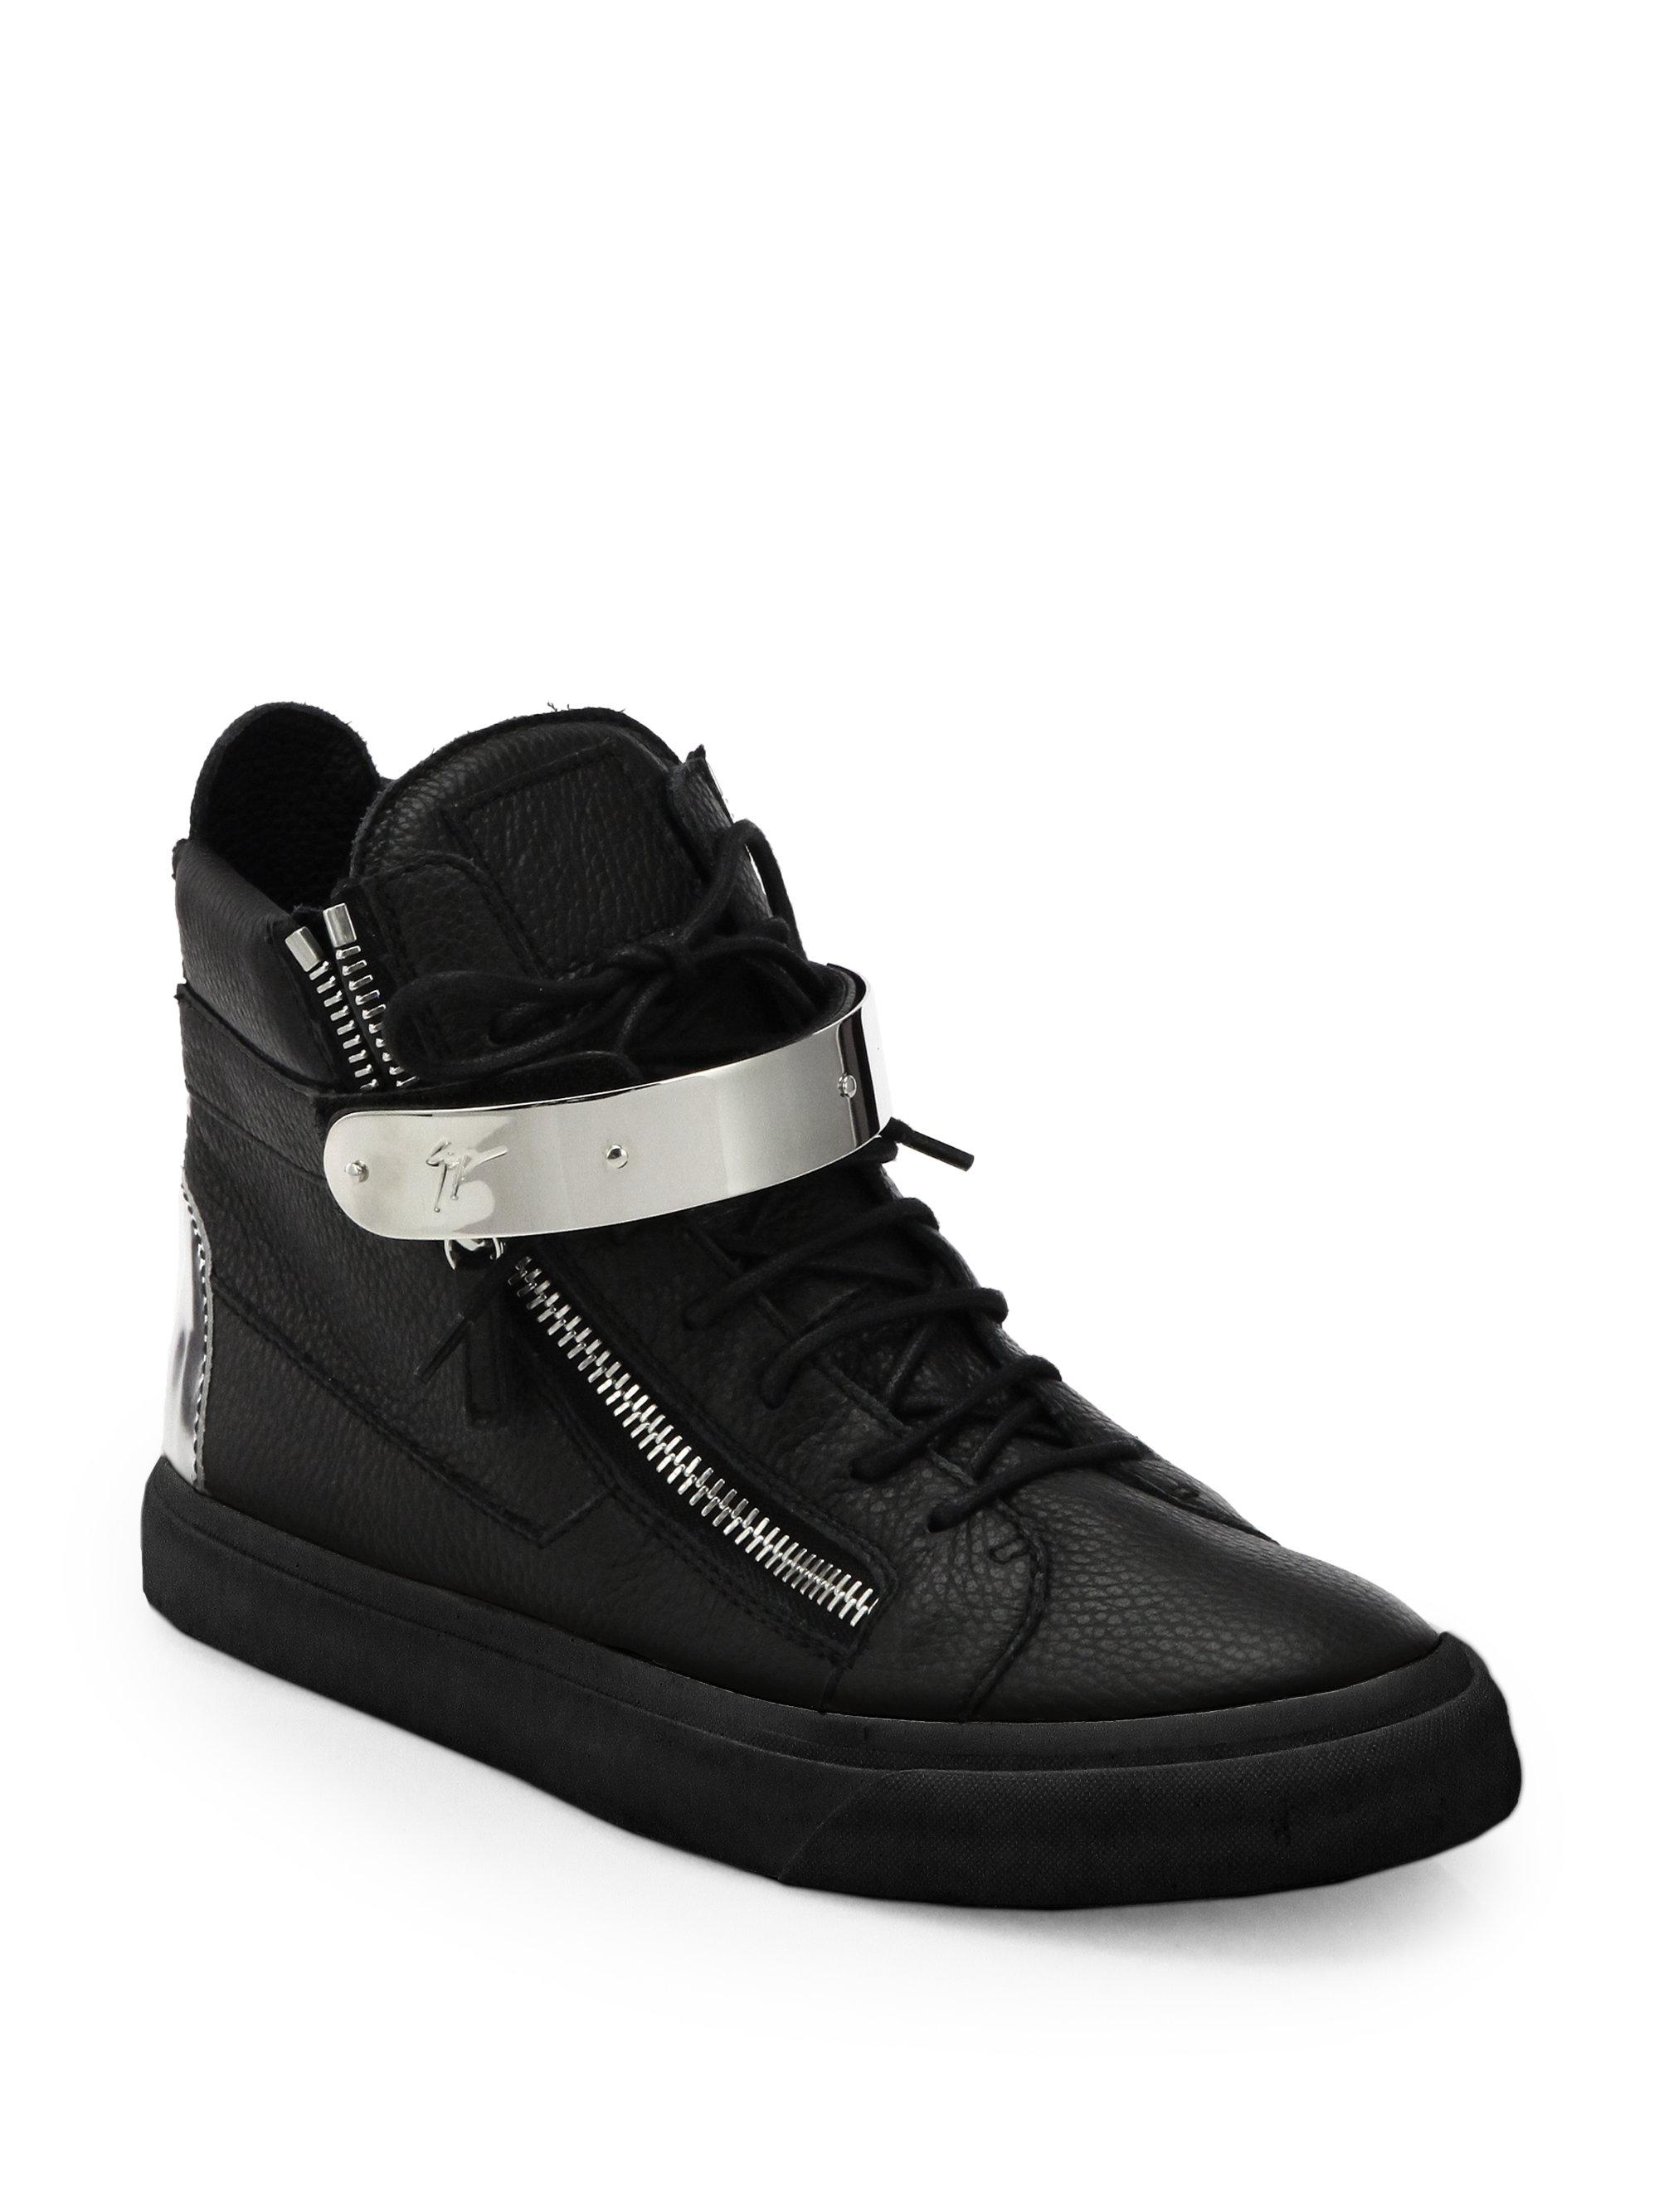 Giuseppe Zanotti. Men's Black Double-zip Bar High-top Sneaker